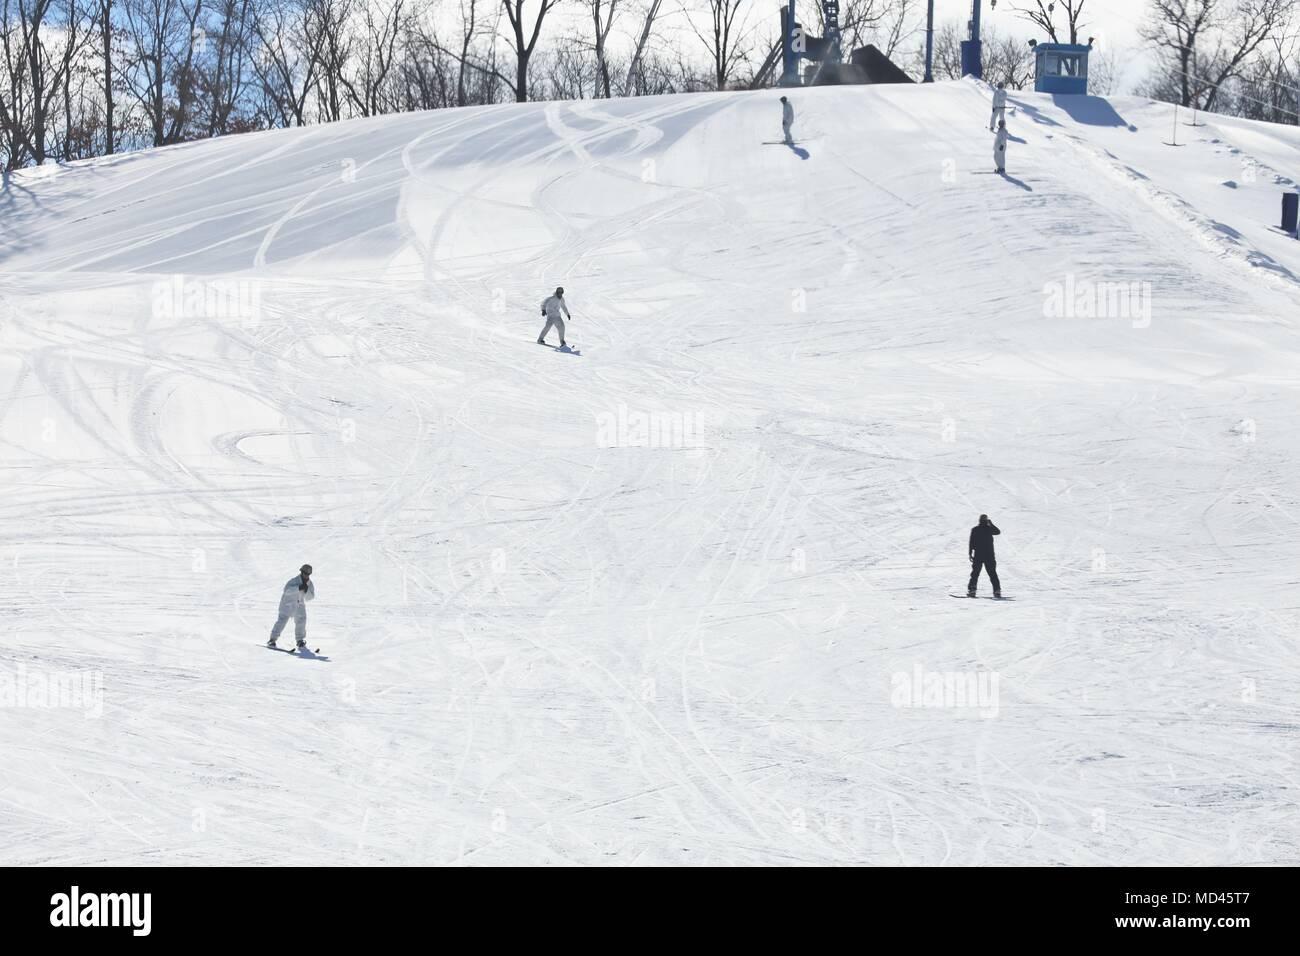 ski area management stock photos & ski area management stock images